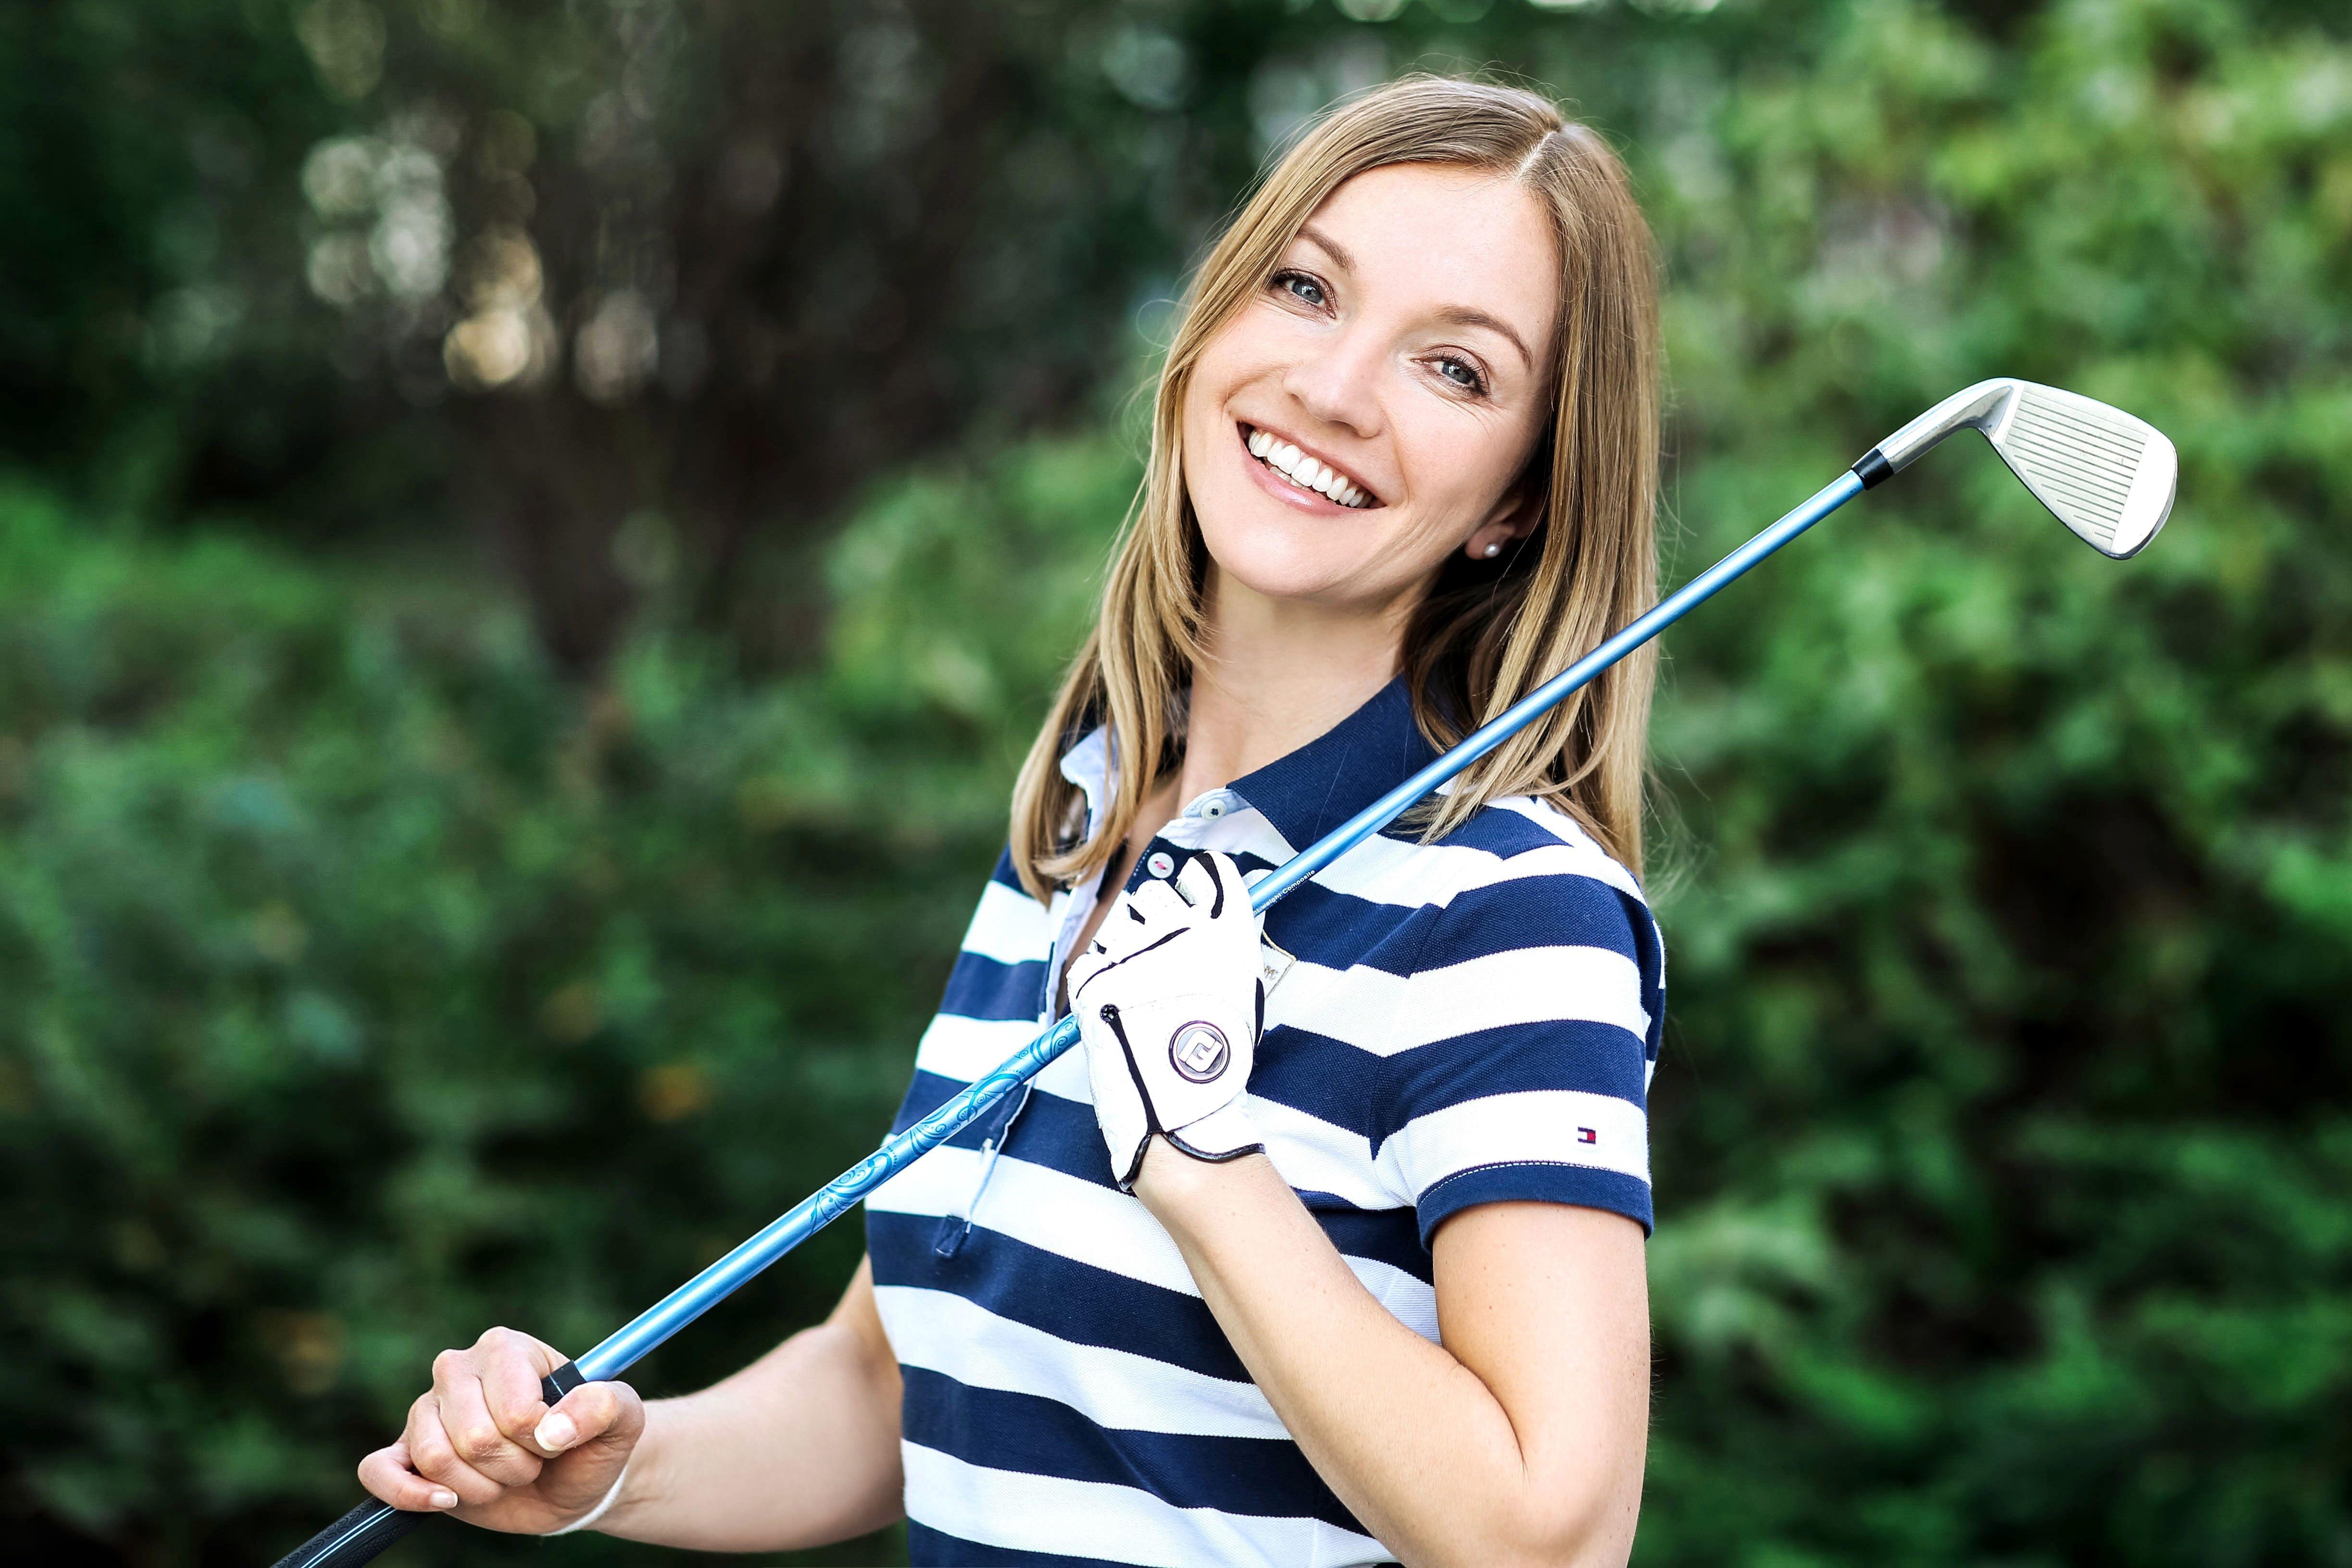 Avatar of golfer named Anita Raaflaub